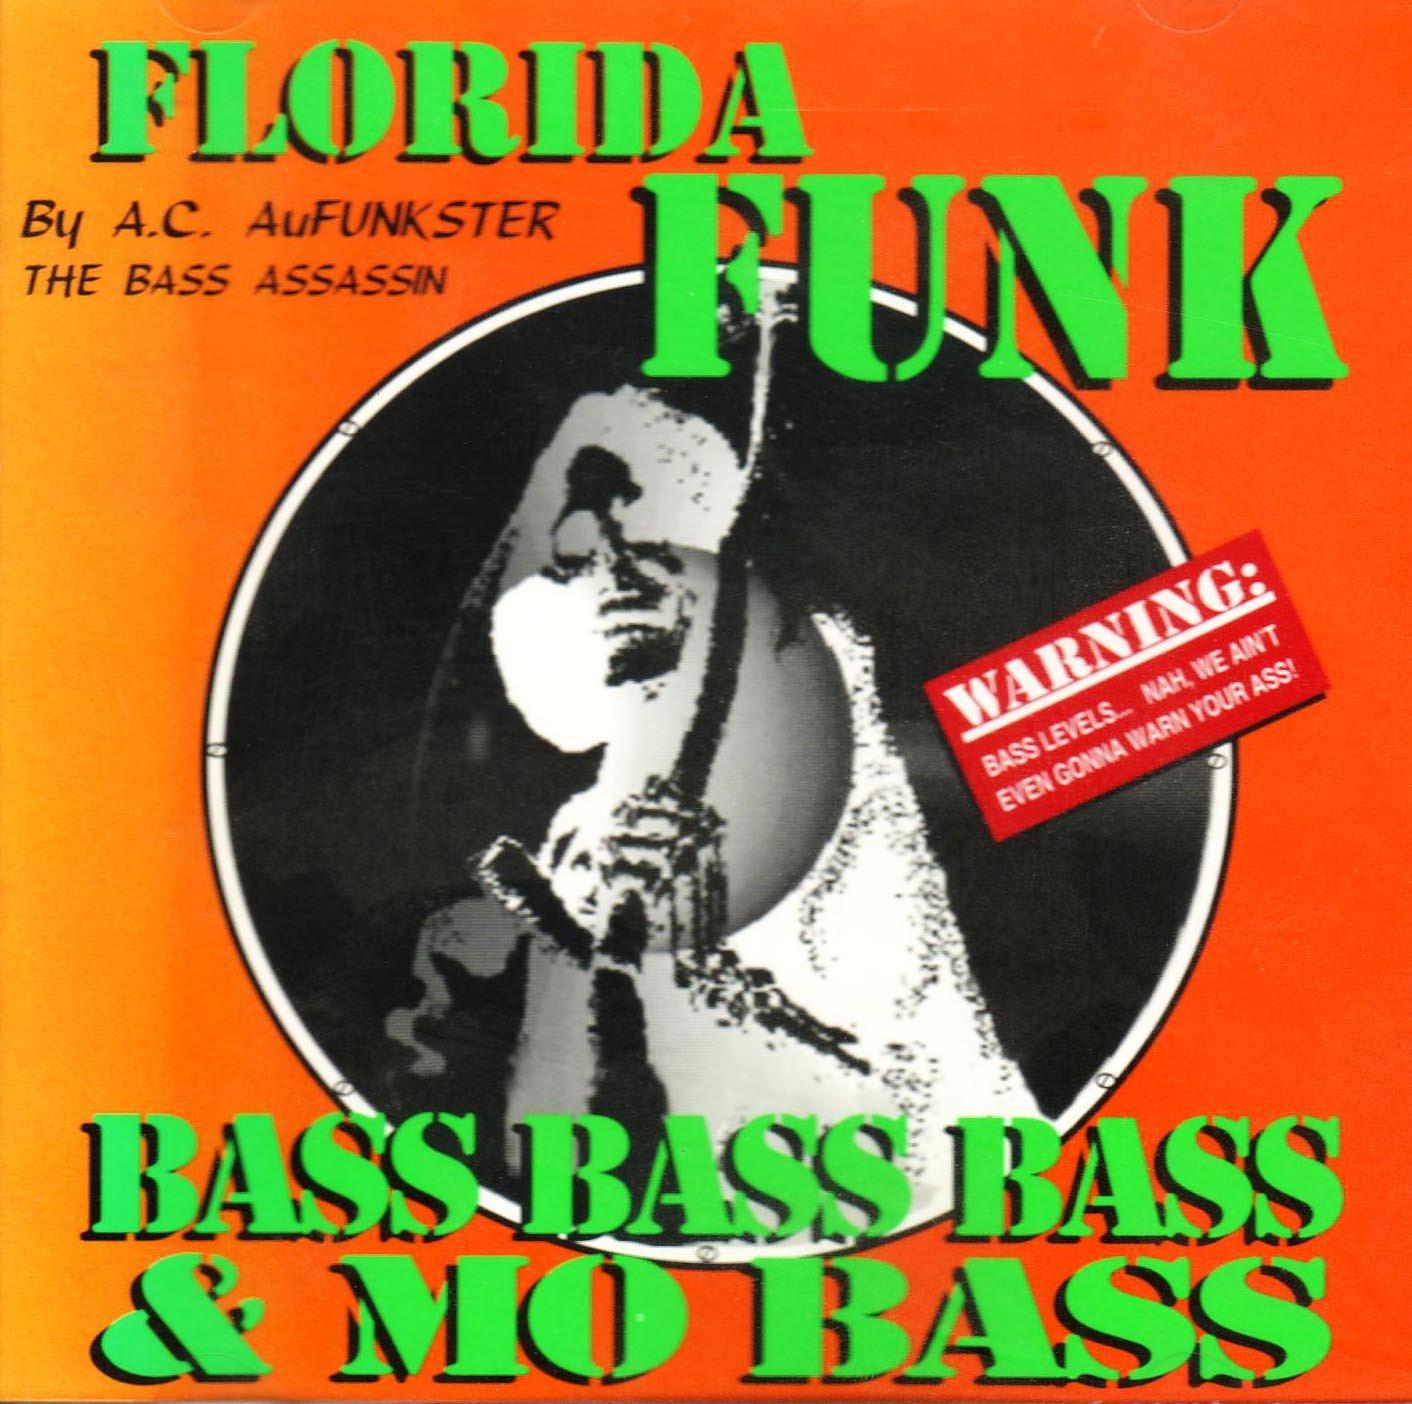 Bass Bass Bass & Mo Bass